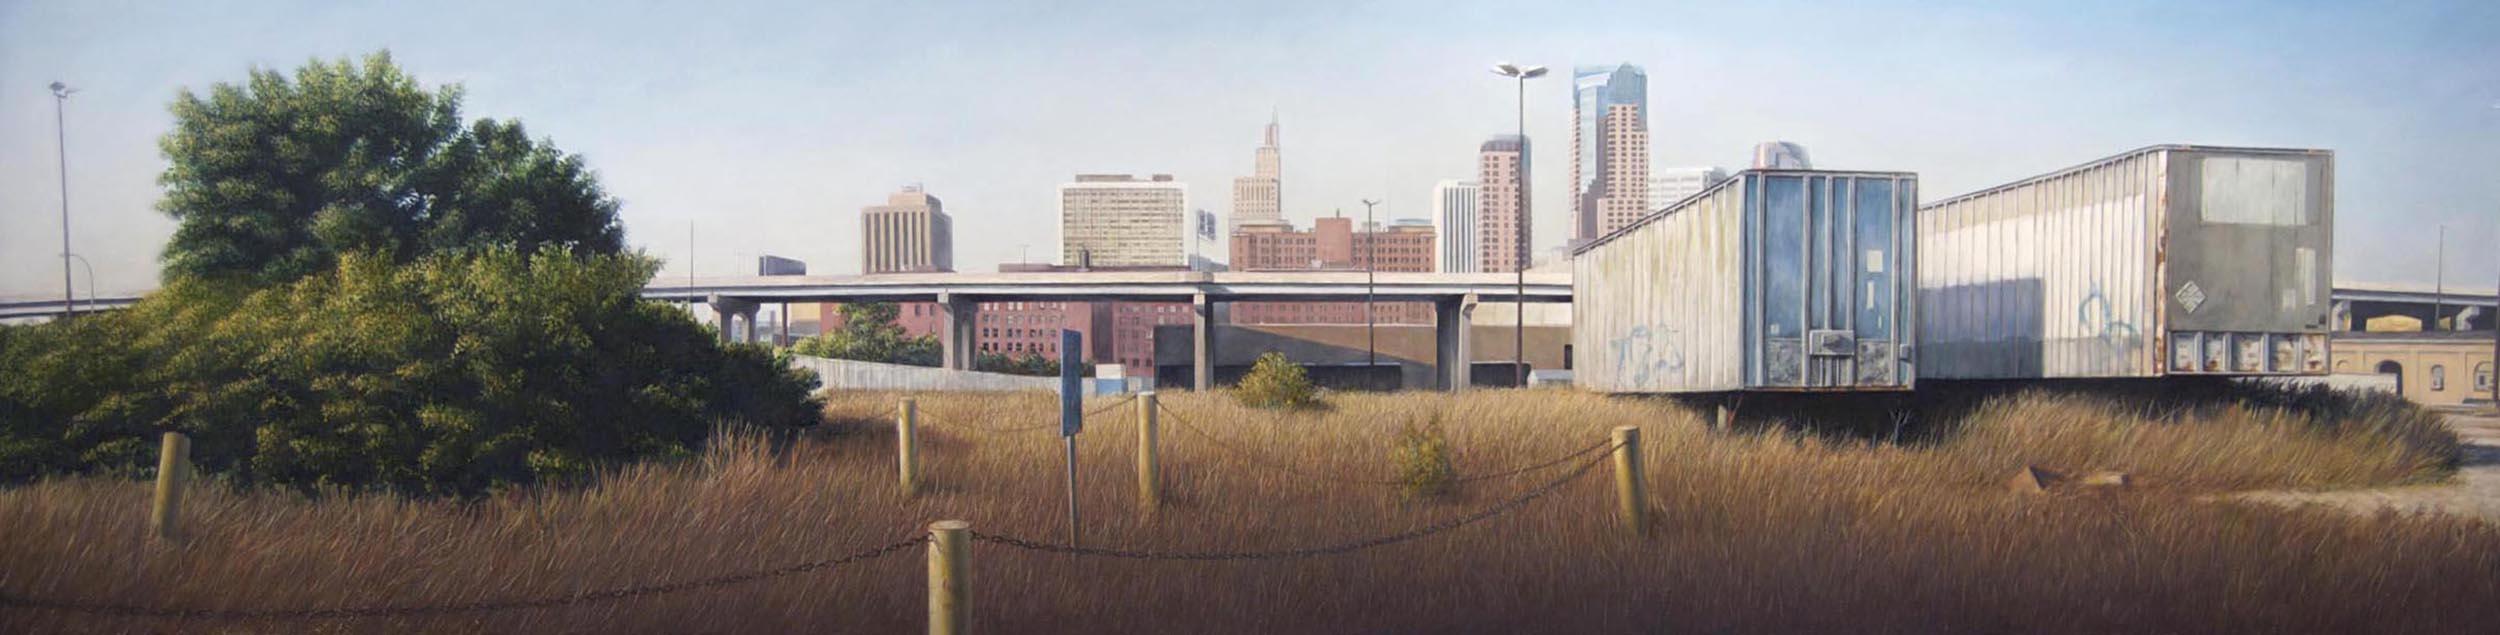 City's Edge, Saint Paul   2014  Oil on canvas over panel  22 x 84 inches